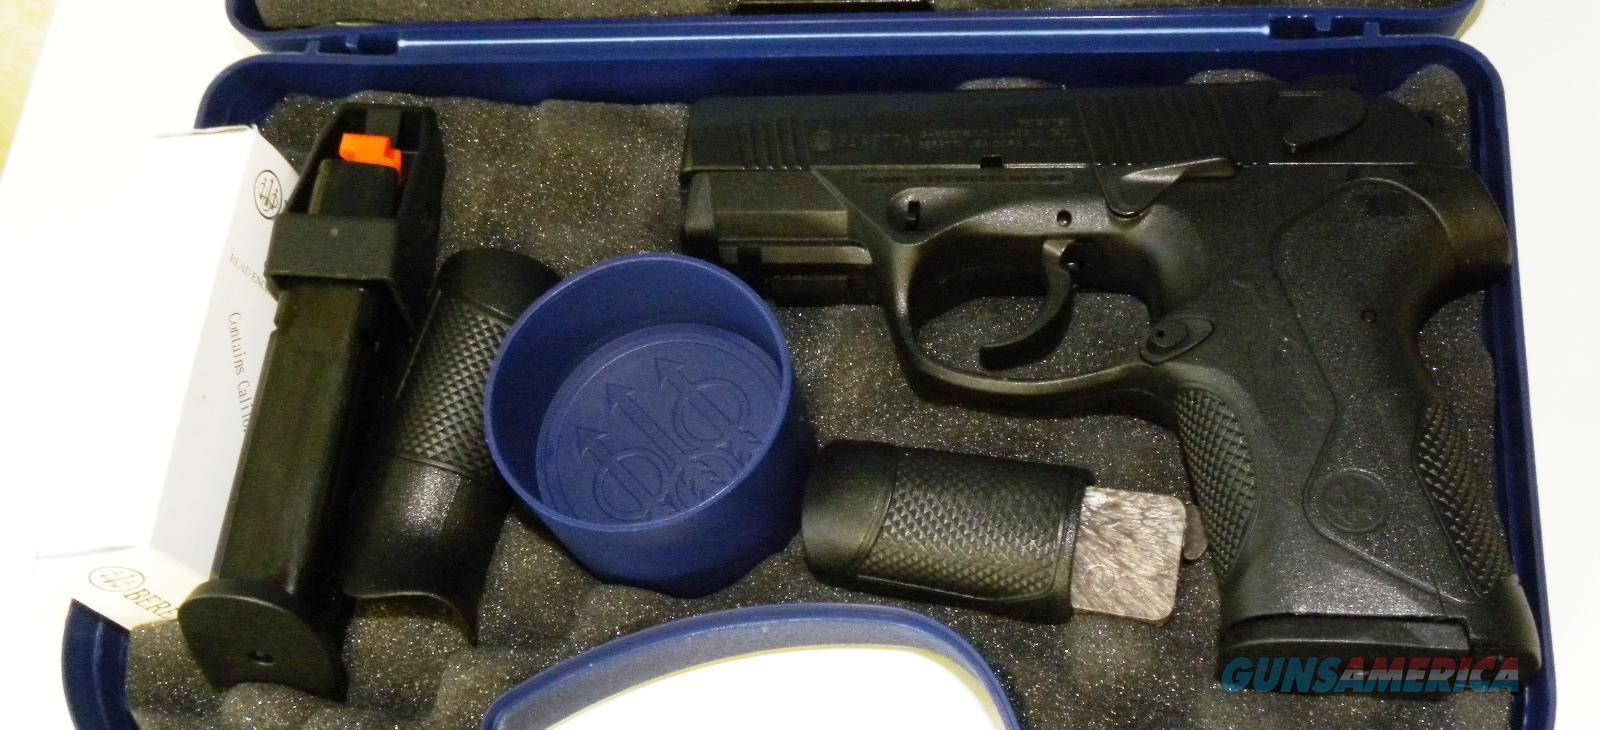 Beretta PX4 Compact 40 S&W  Guns > Pistols > Beretta Pistols > Polymer Frame